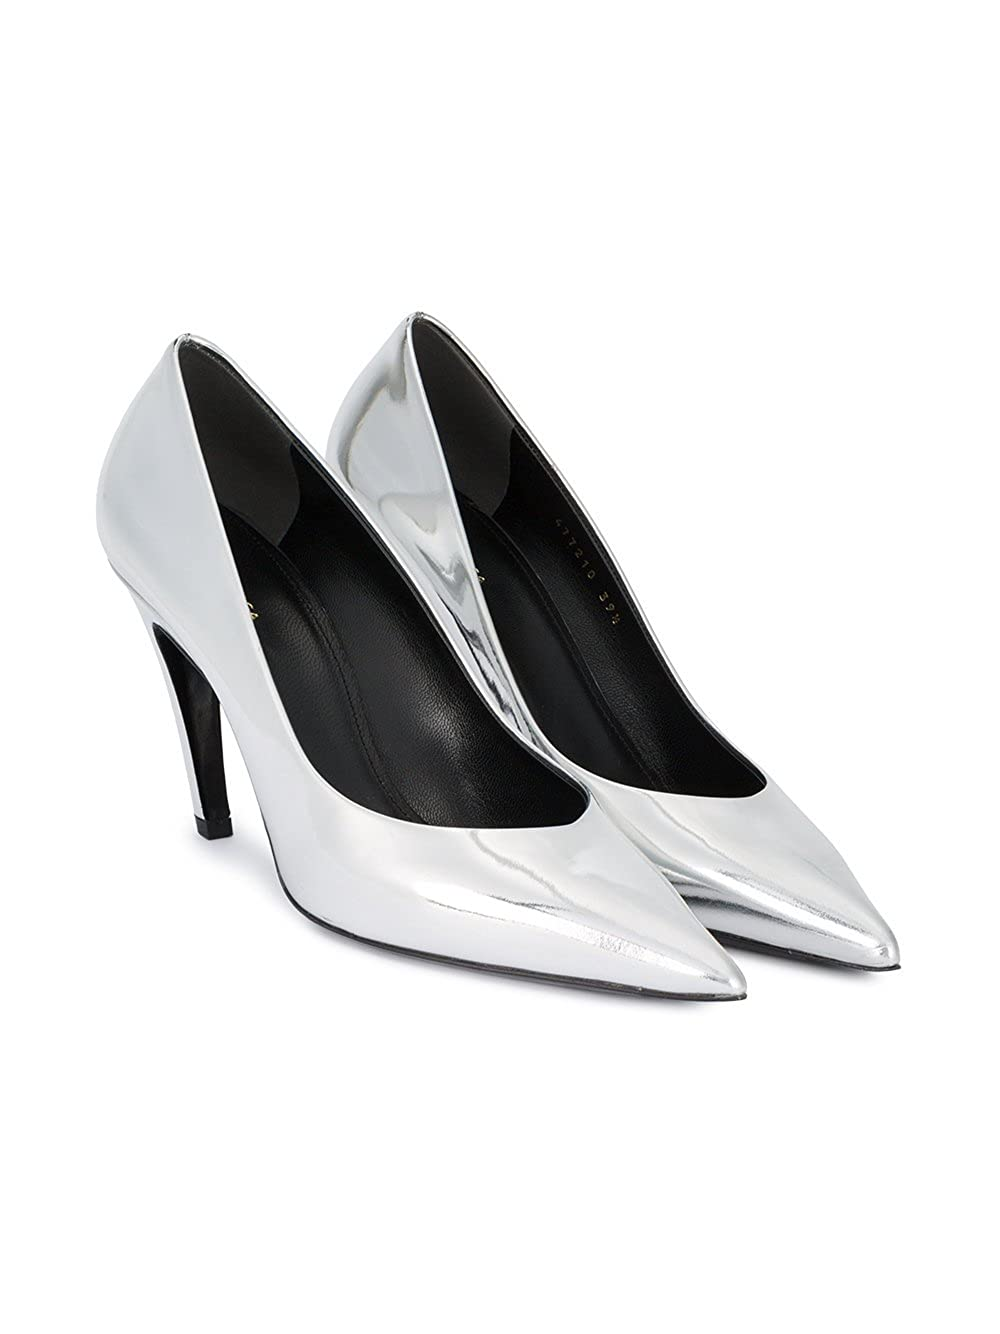 Balenciaga Damen 477210Wa0v08106 Silber Leder Pumps  Amazon.de  Schuhe    Handtaschen 9774b65fb6